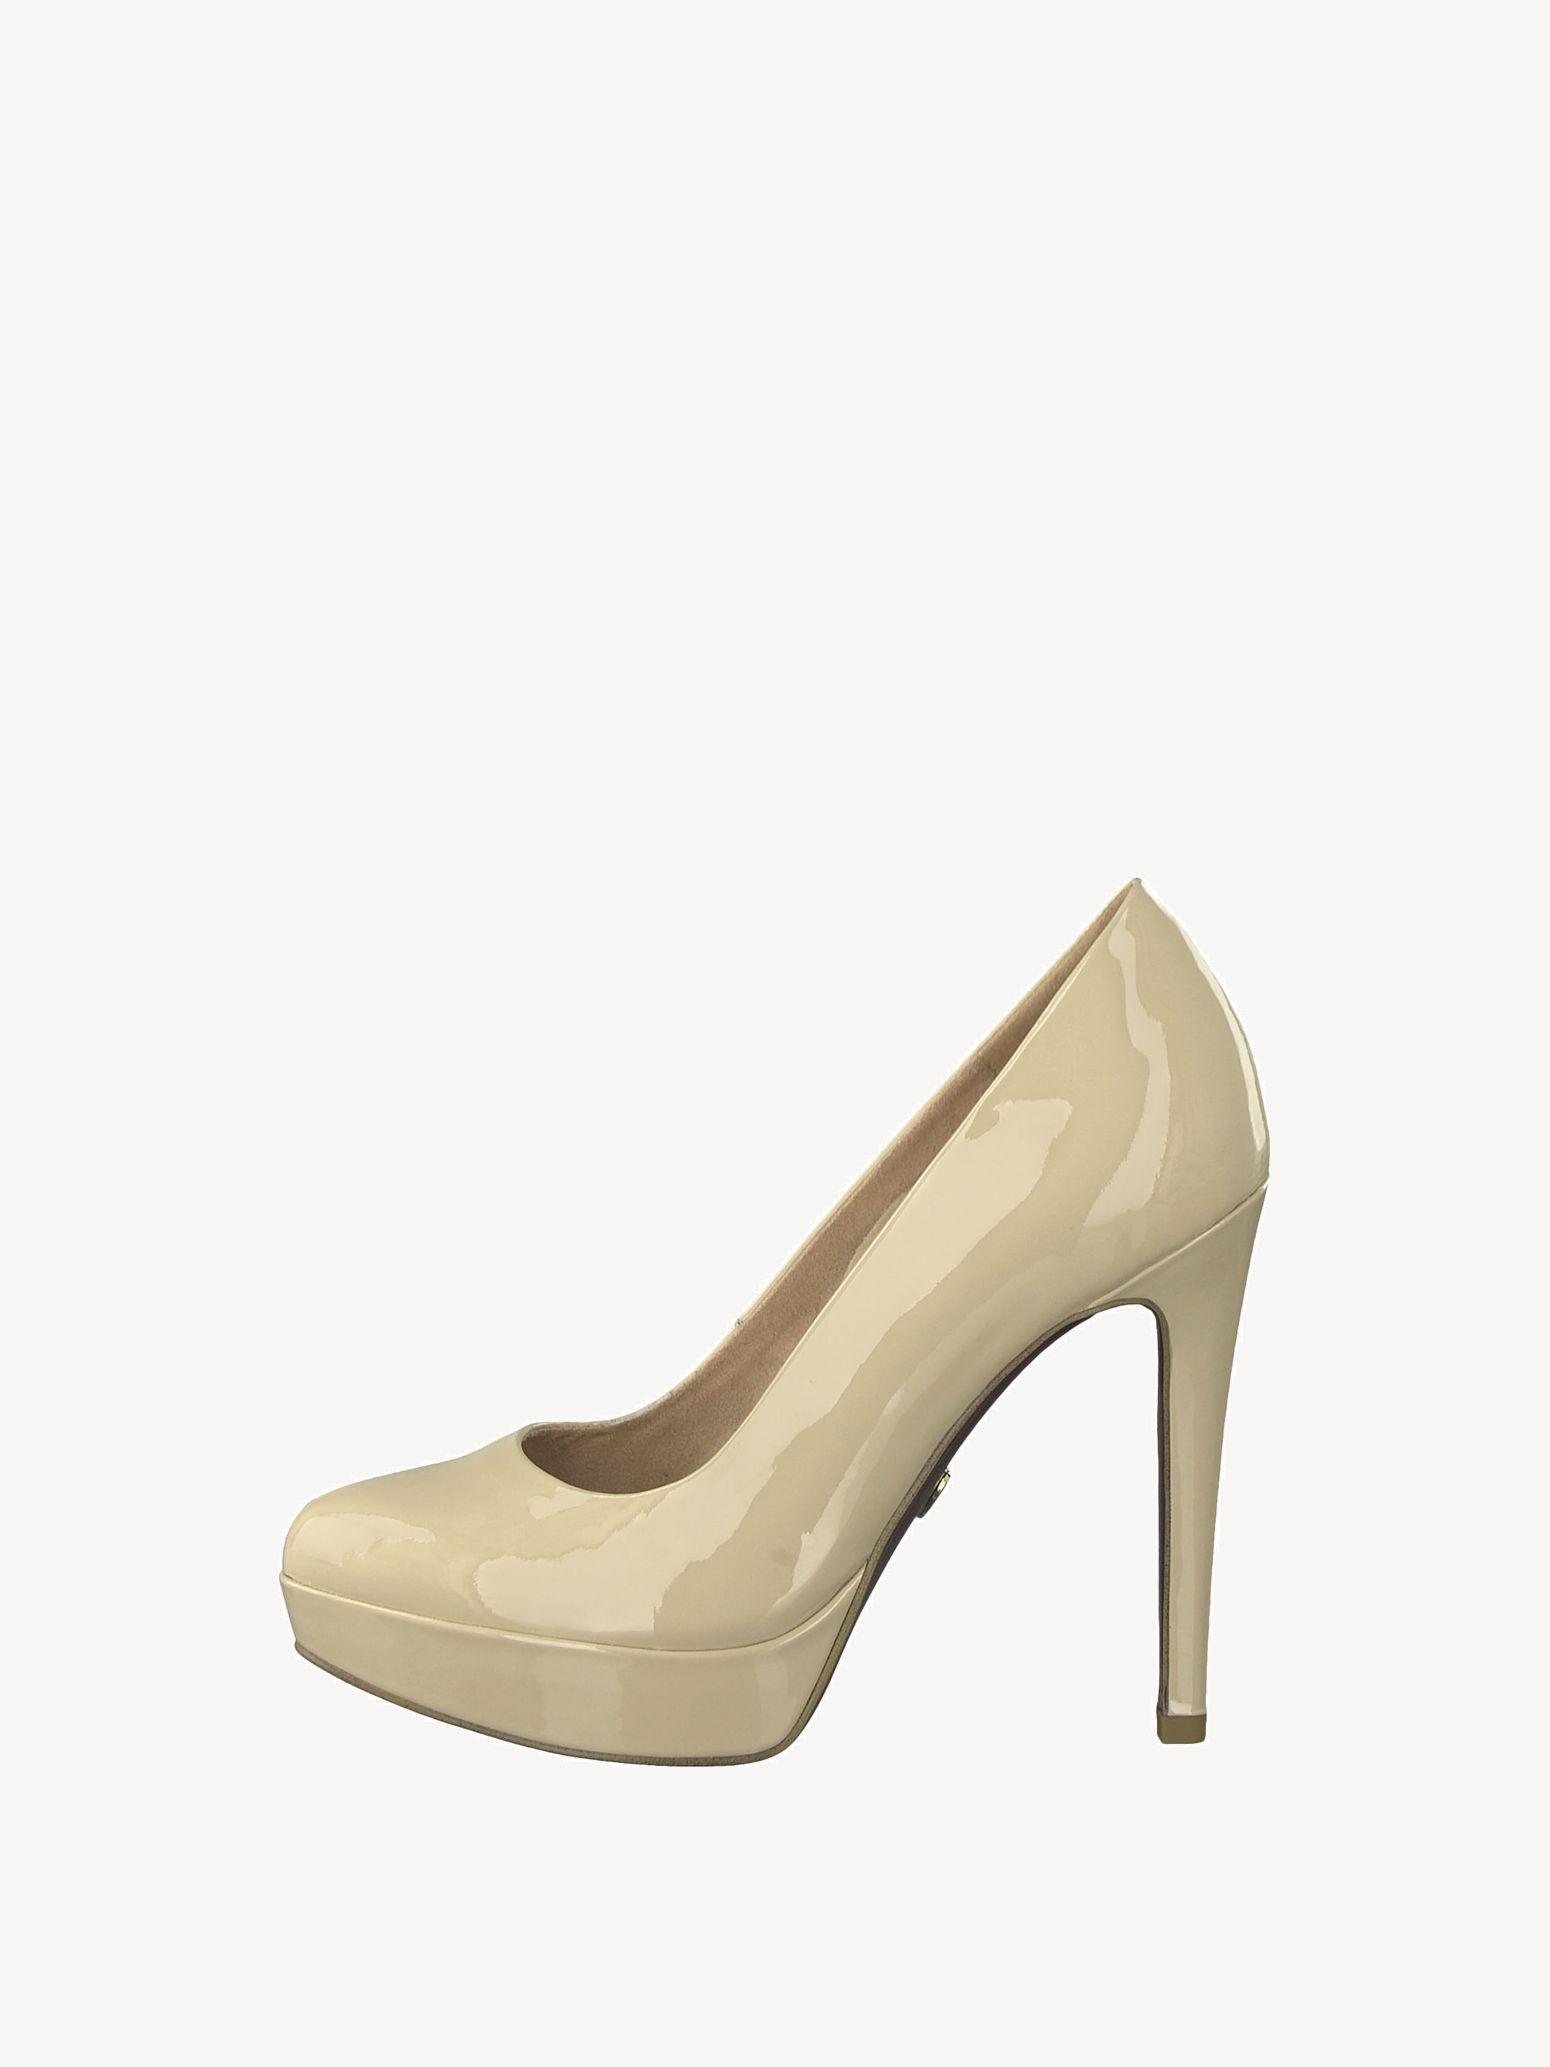 Lederpumps beige 1 1 22430 22 253 36: Tamaris High Heels